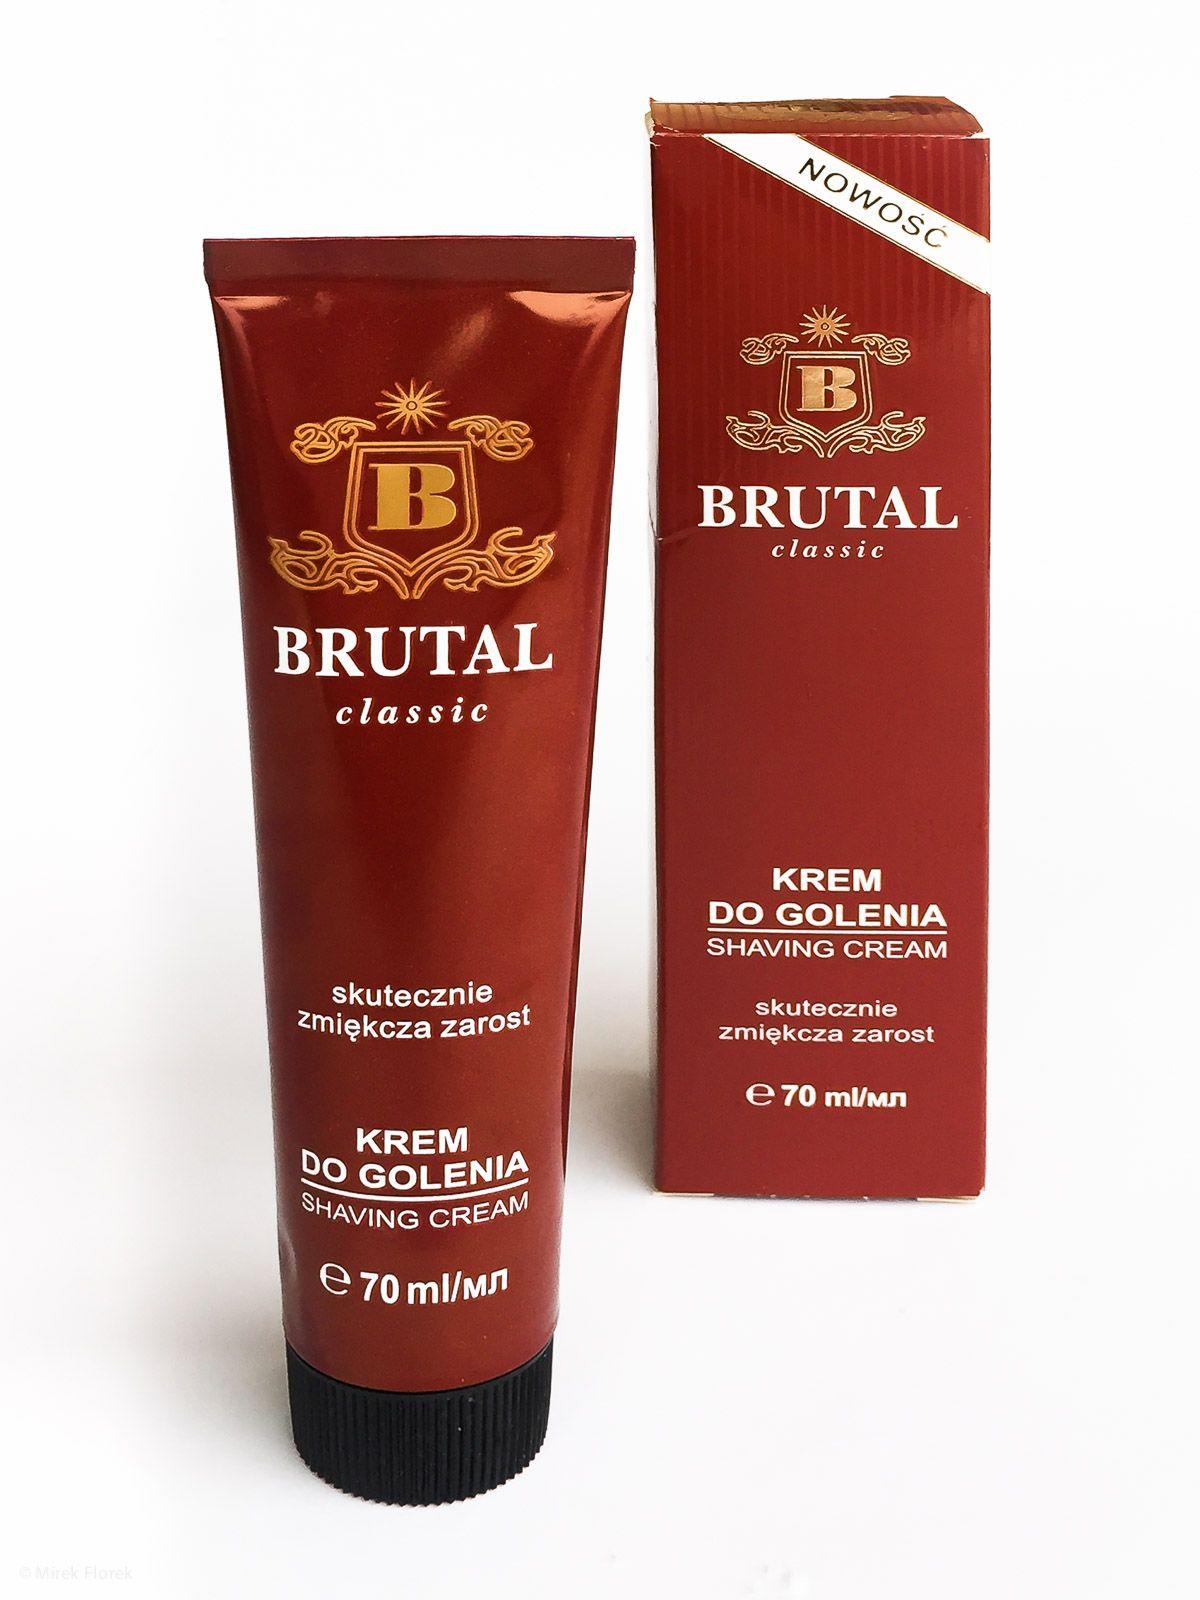 Krem do golenia La Rive Brutal Classic